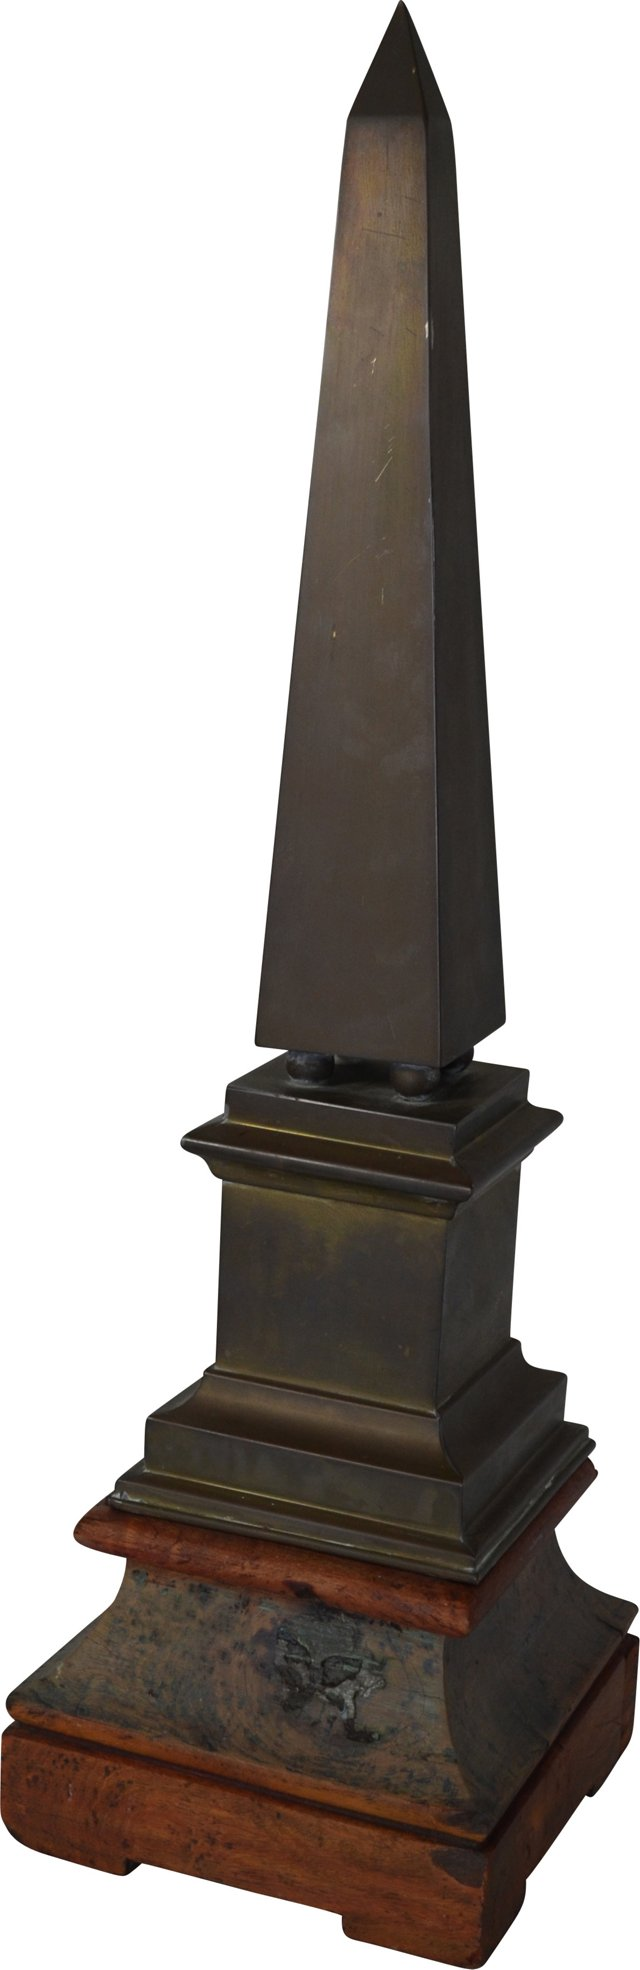 Brass Obelisk on Stand